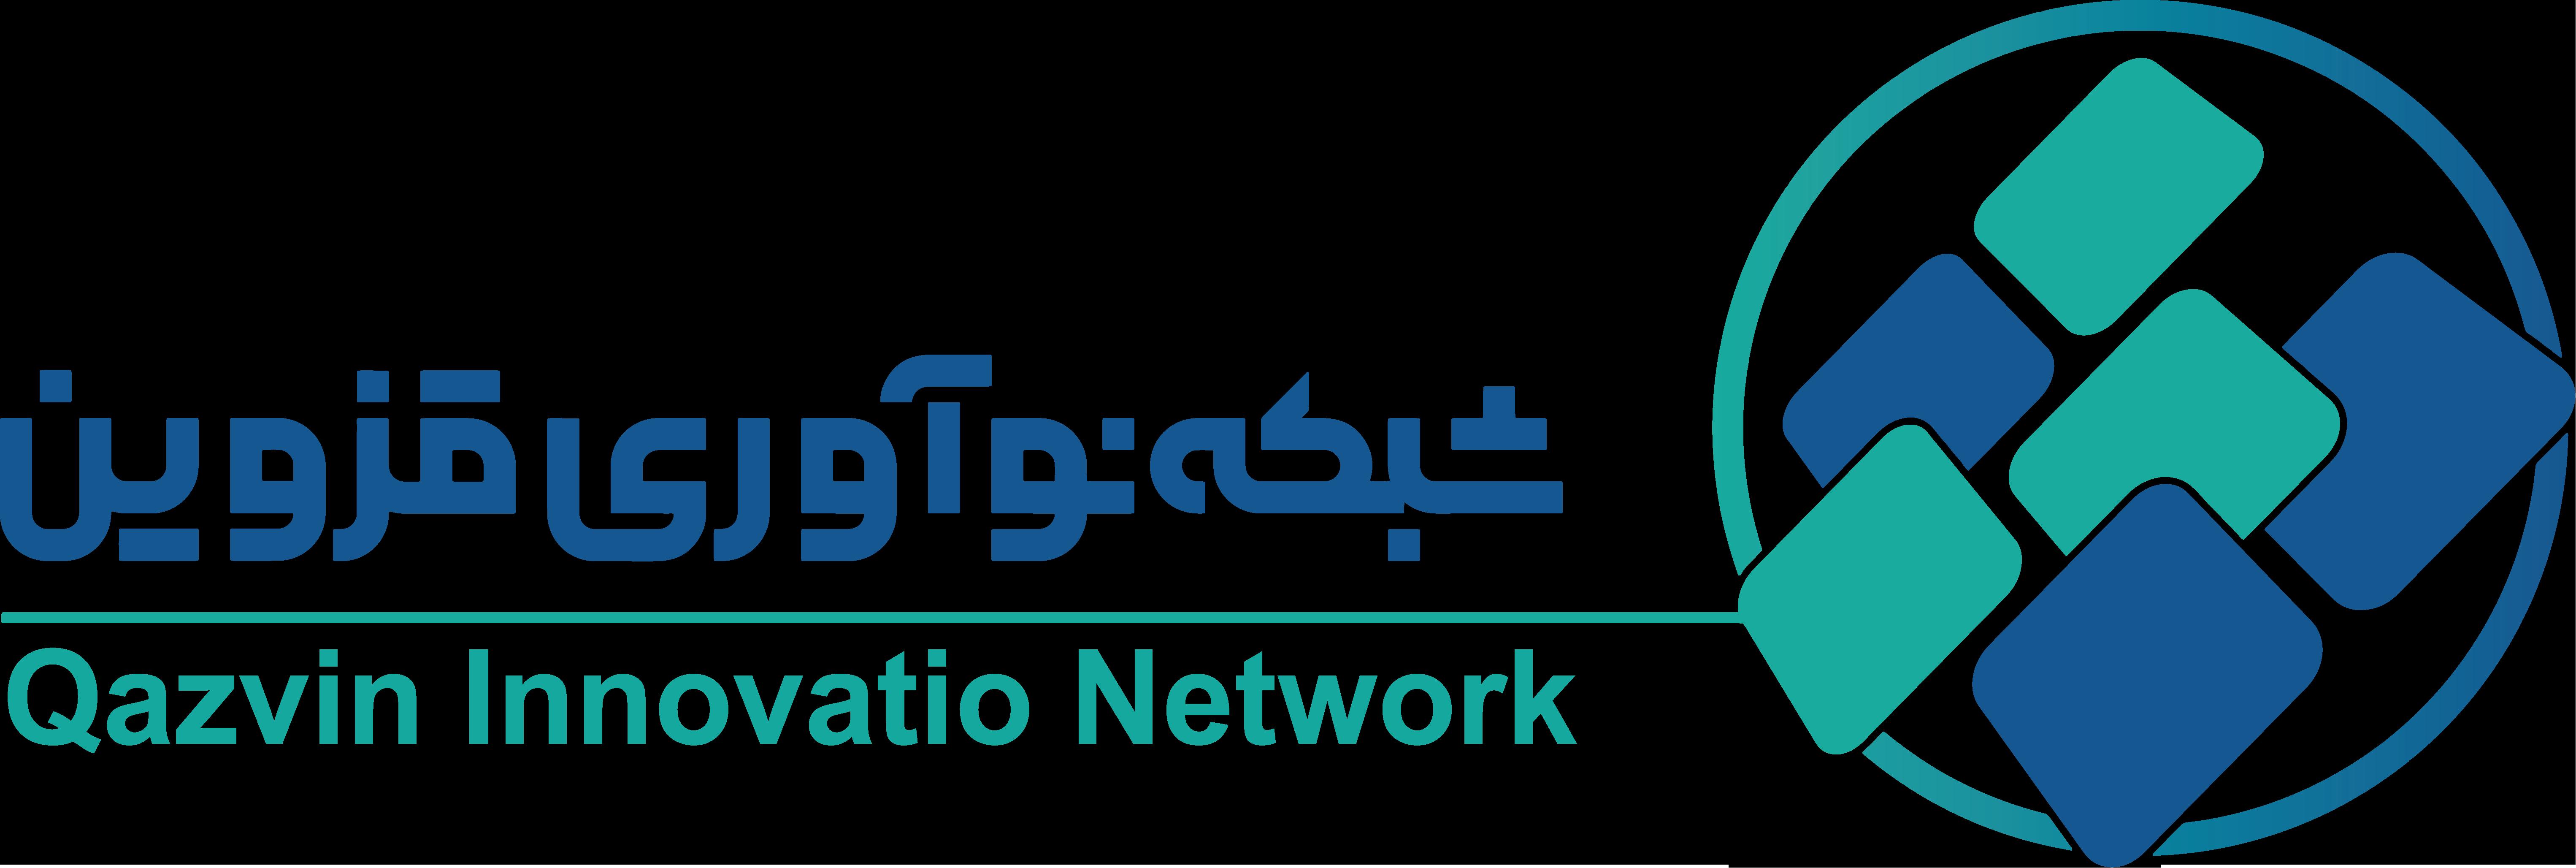 شبکه نوآوری قزوین